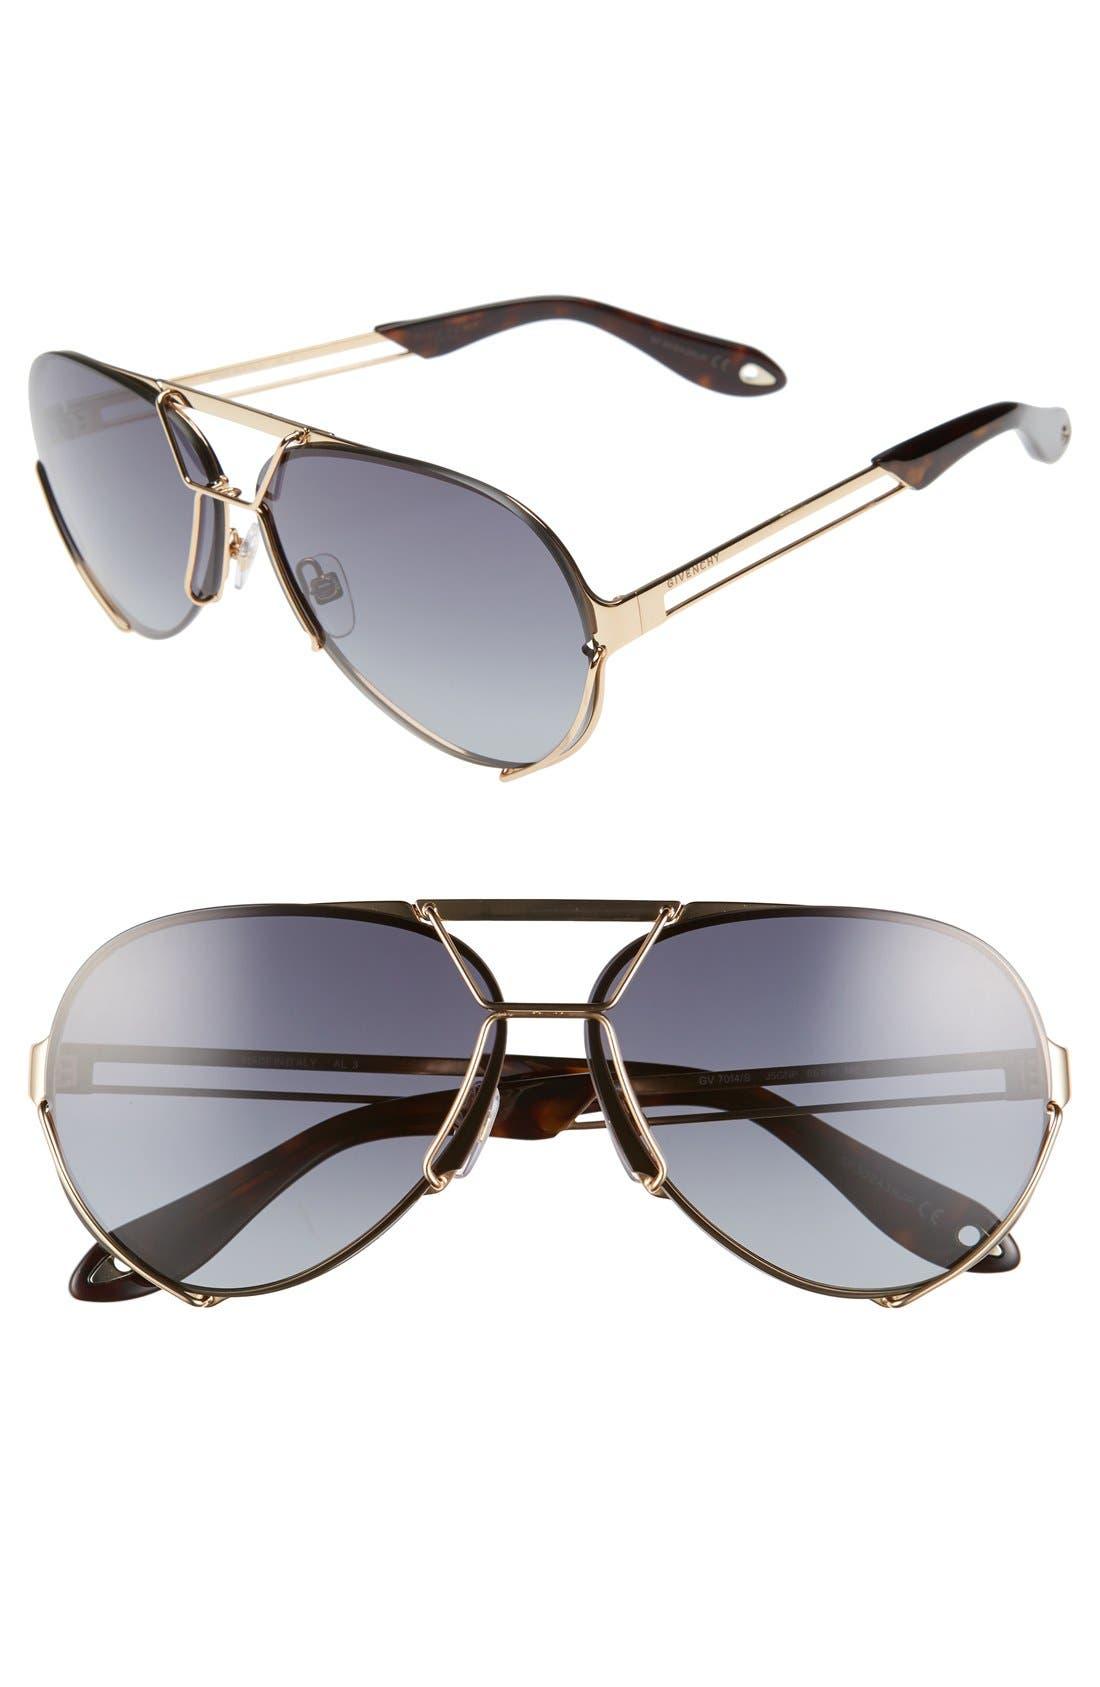 65mm Aviator Sunglasses,                         Main,                         color, Gold/ Grey